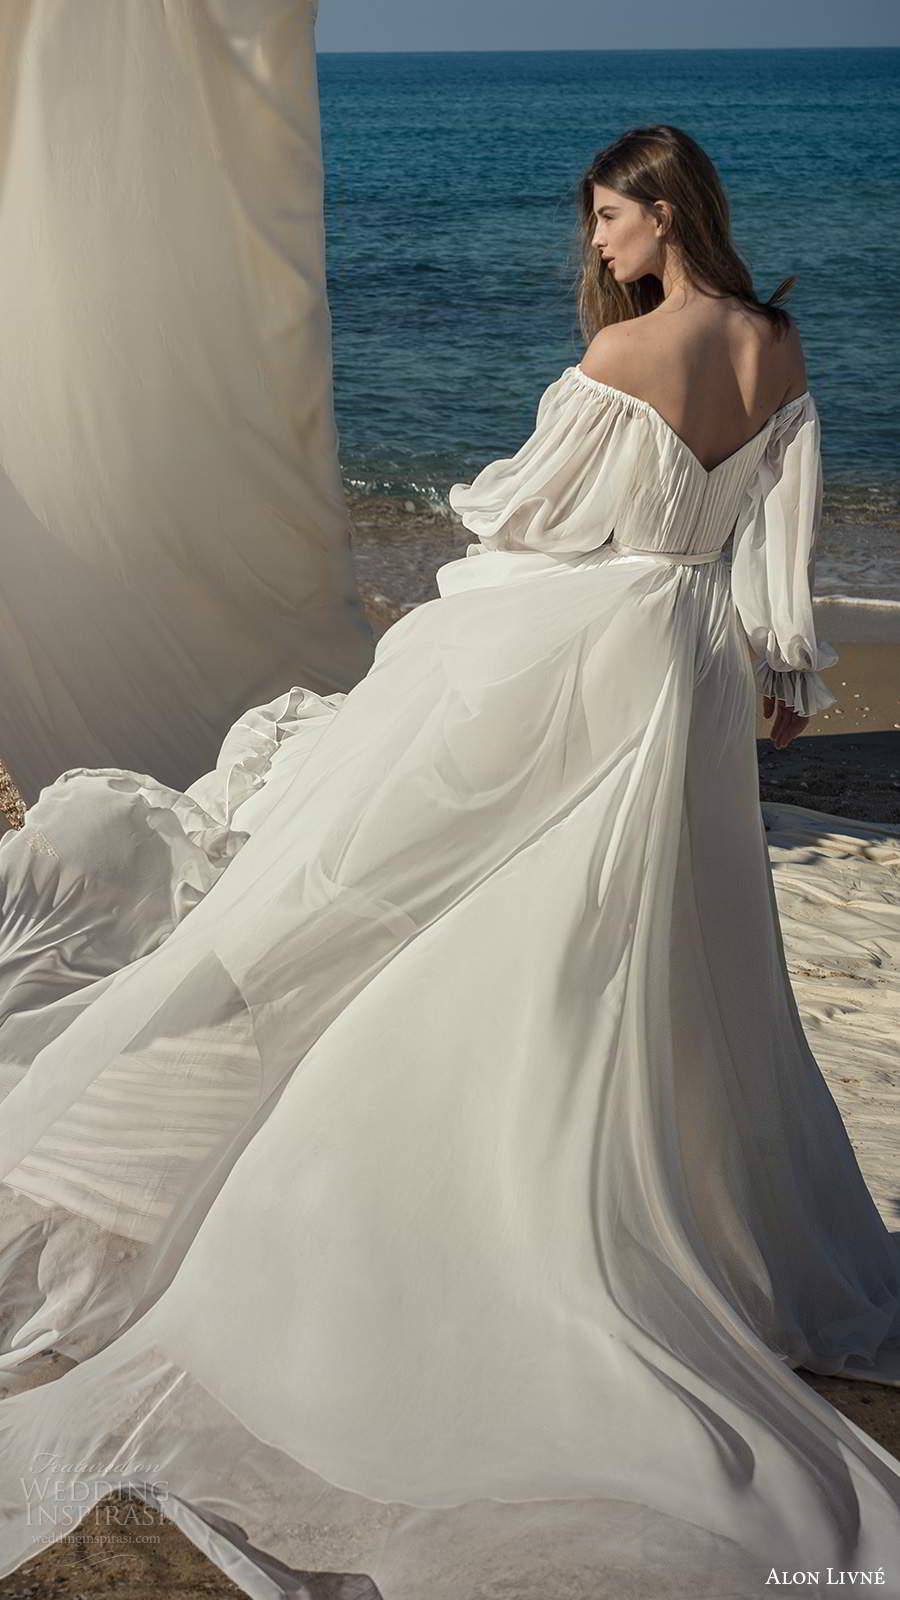 alon livne fall 2020 bridal sheer bishop sleeves off shoulder sweetheart neckline pleated bodice a line ball gown wedding dress v back chapel train (2) bv